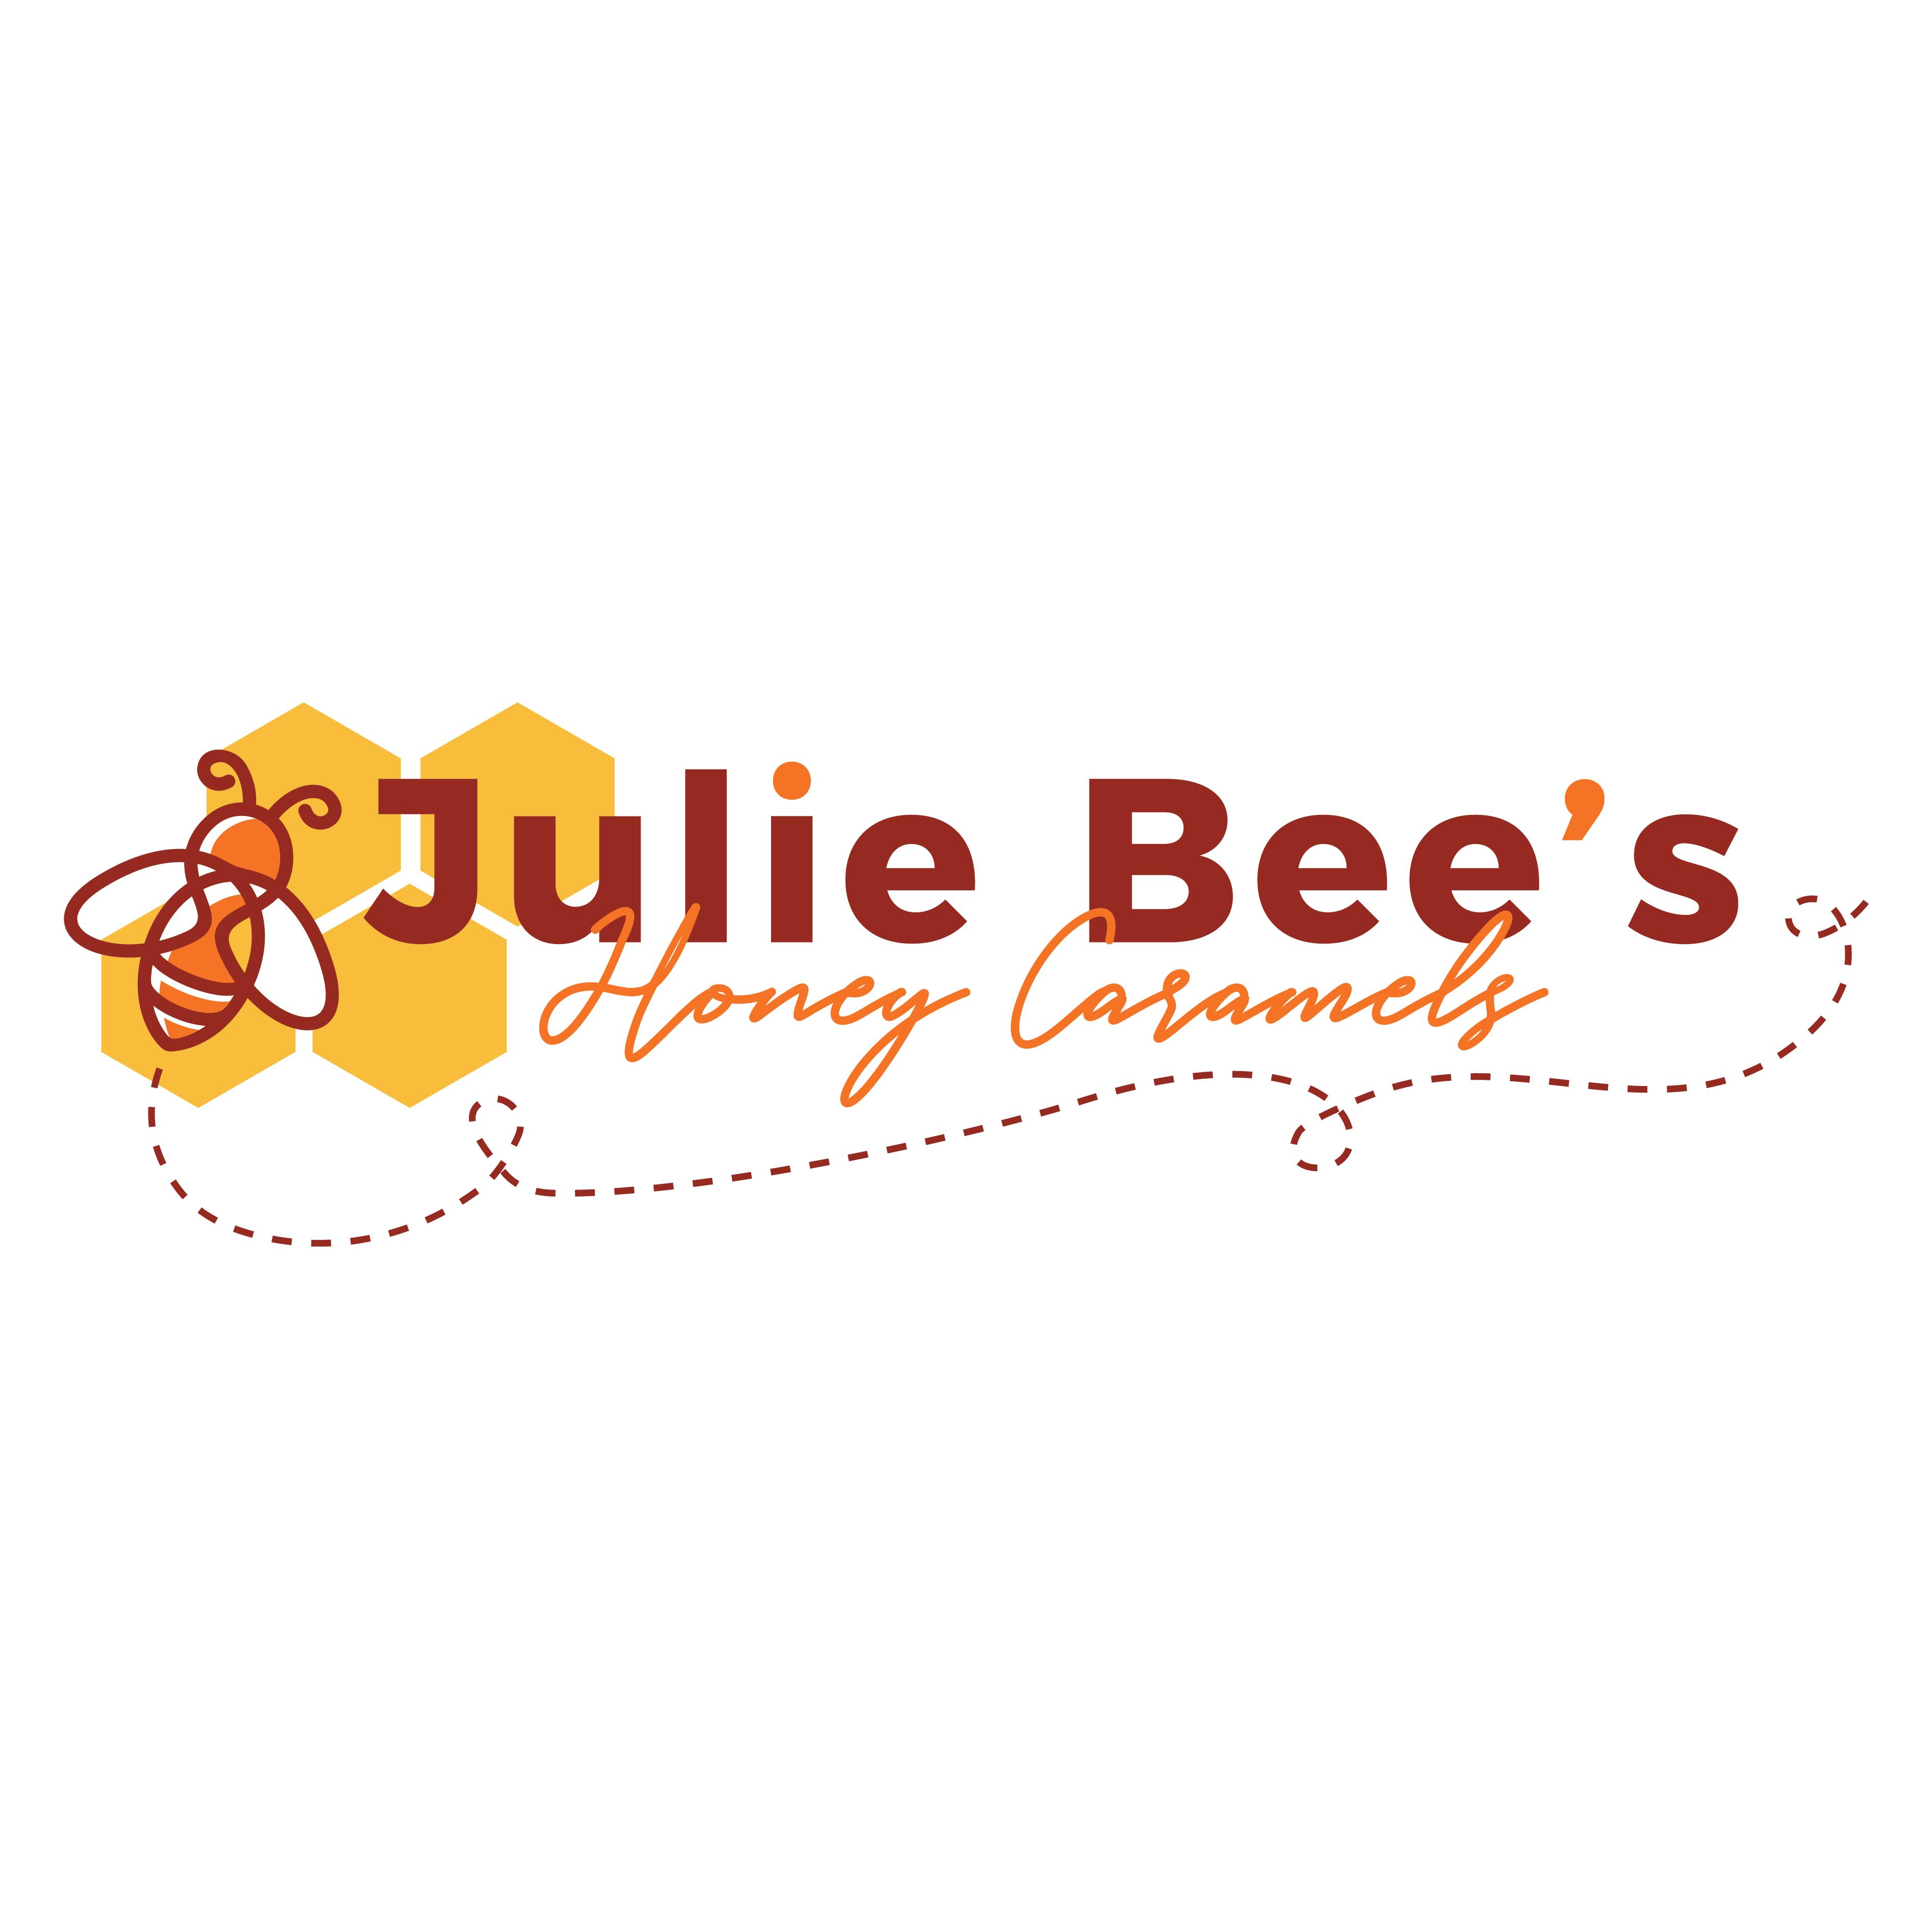 Julie Bee's Honey Caramels